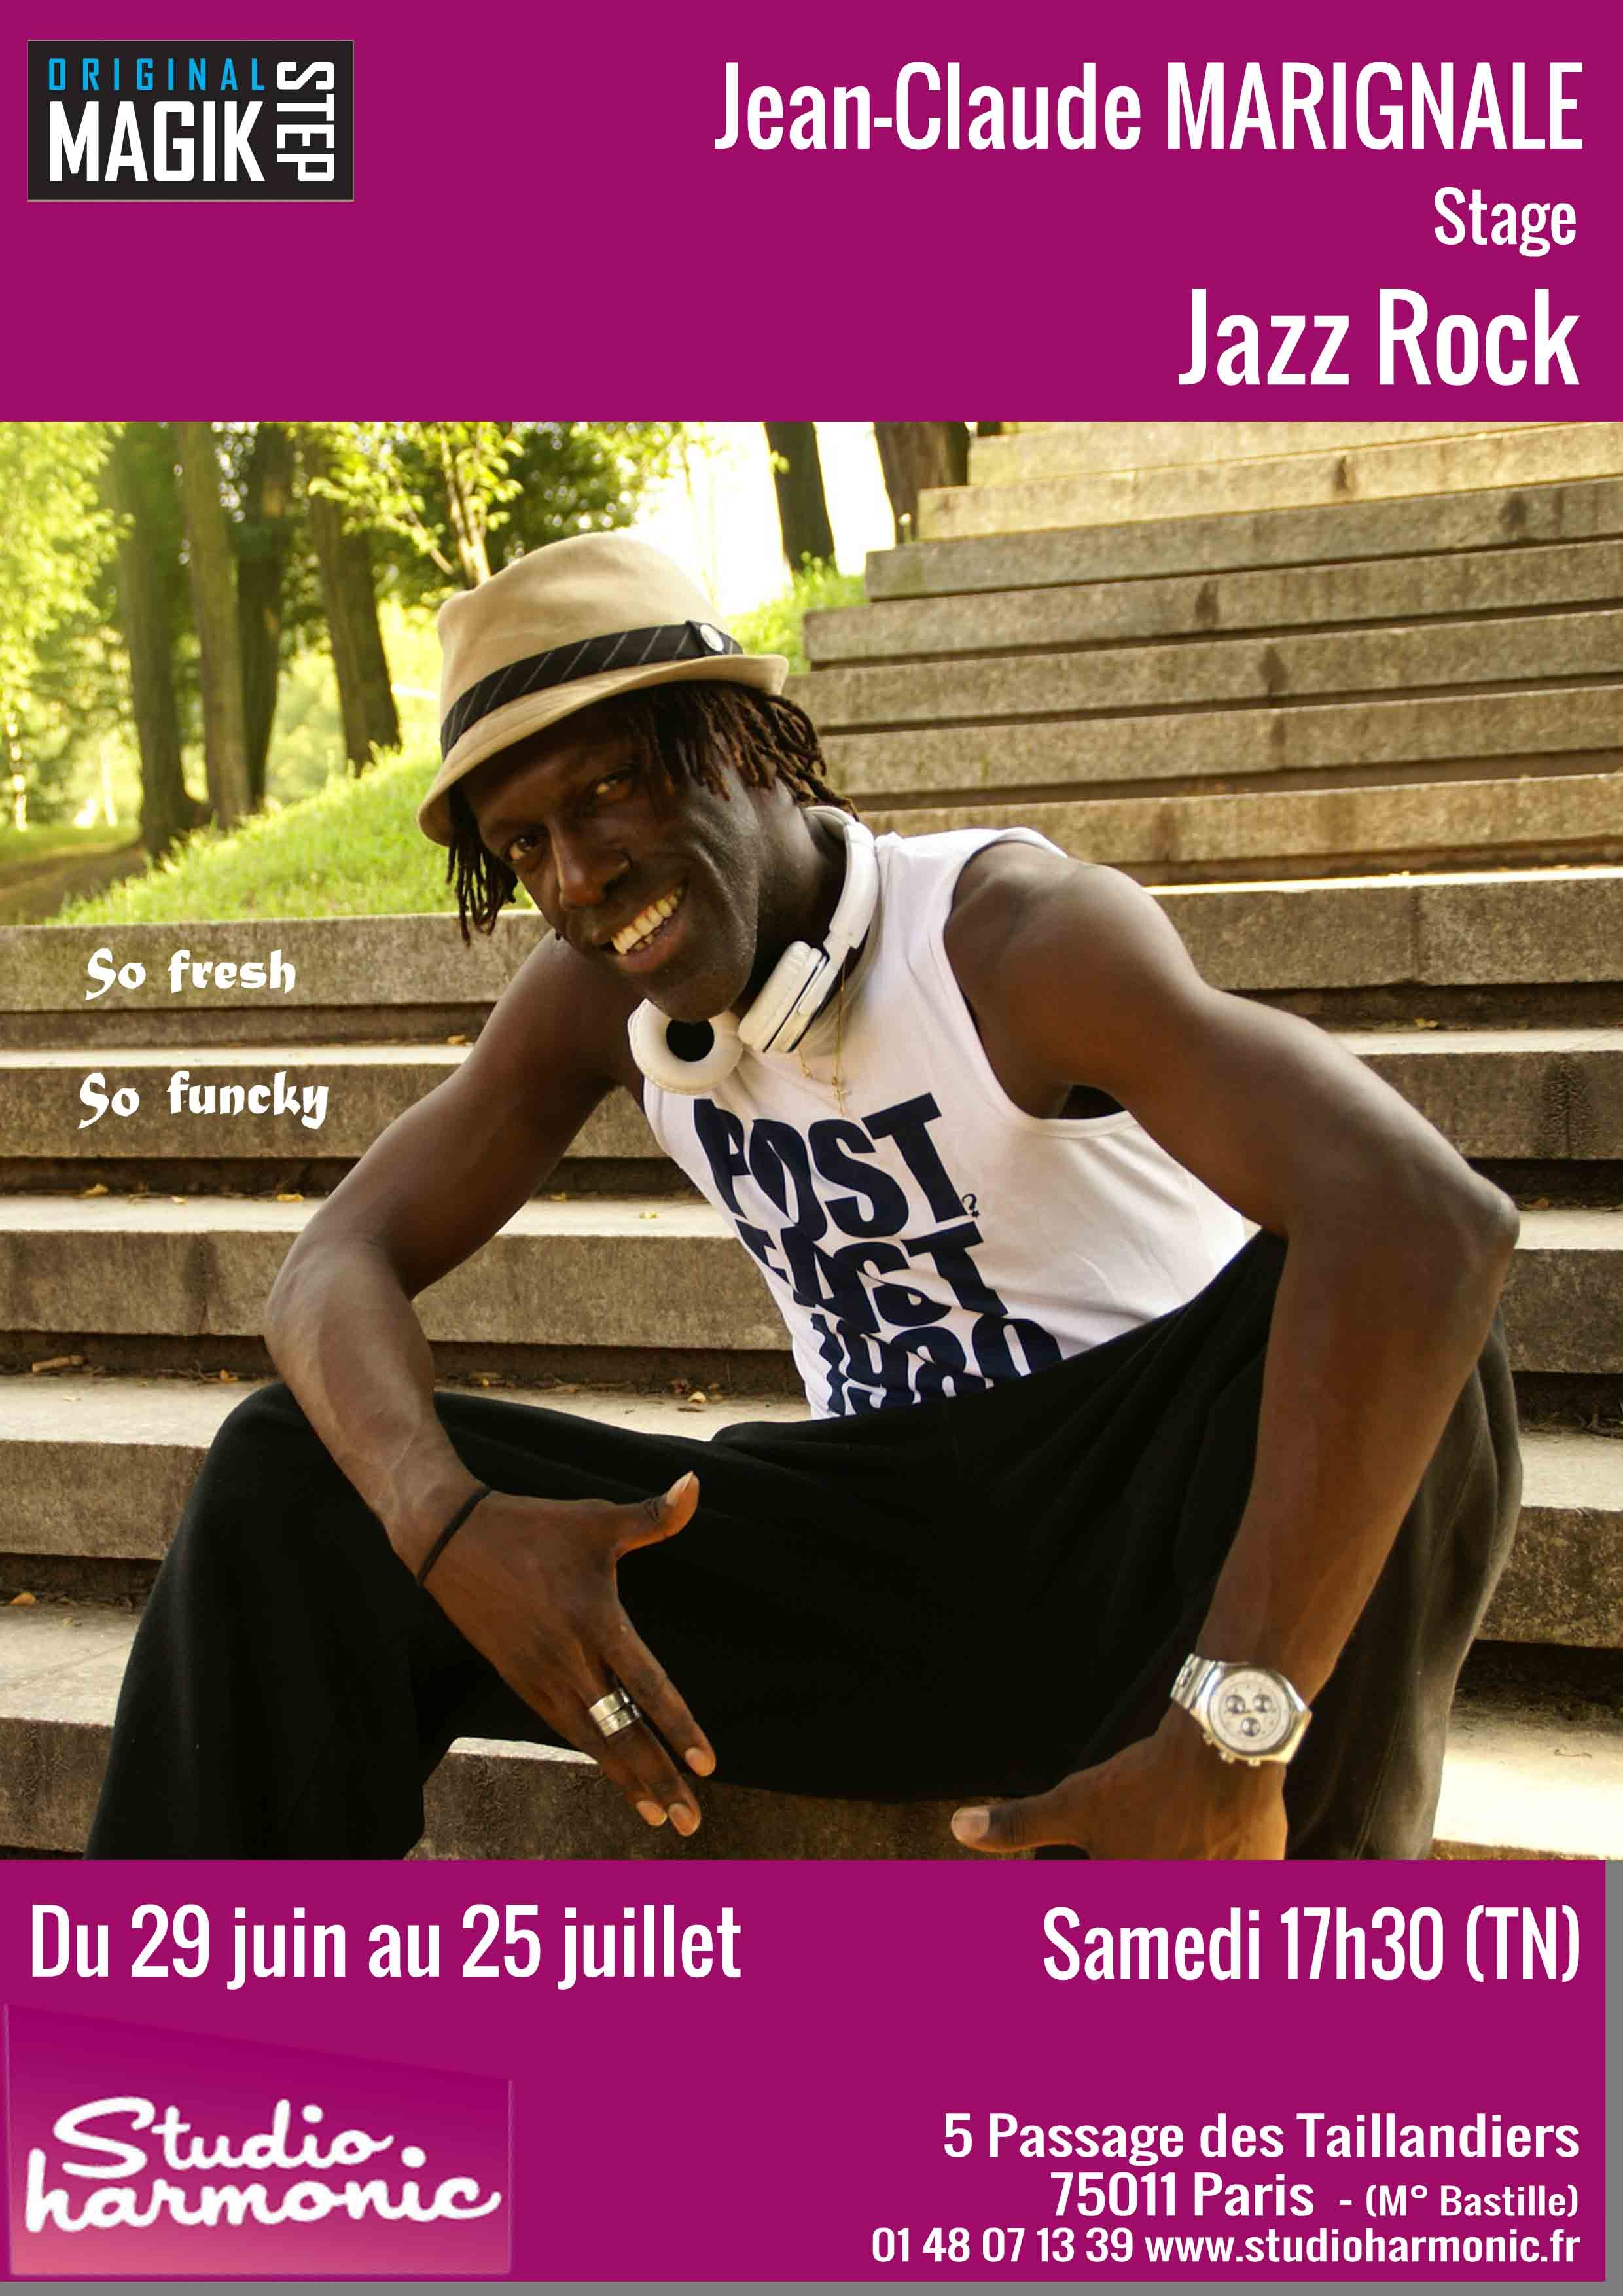 stage-studio-harmonic-studio-du-29-juin-au-25-juillet-2015-jazz-rock_0.jpg